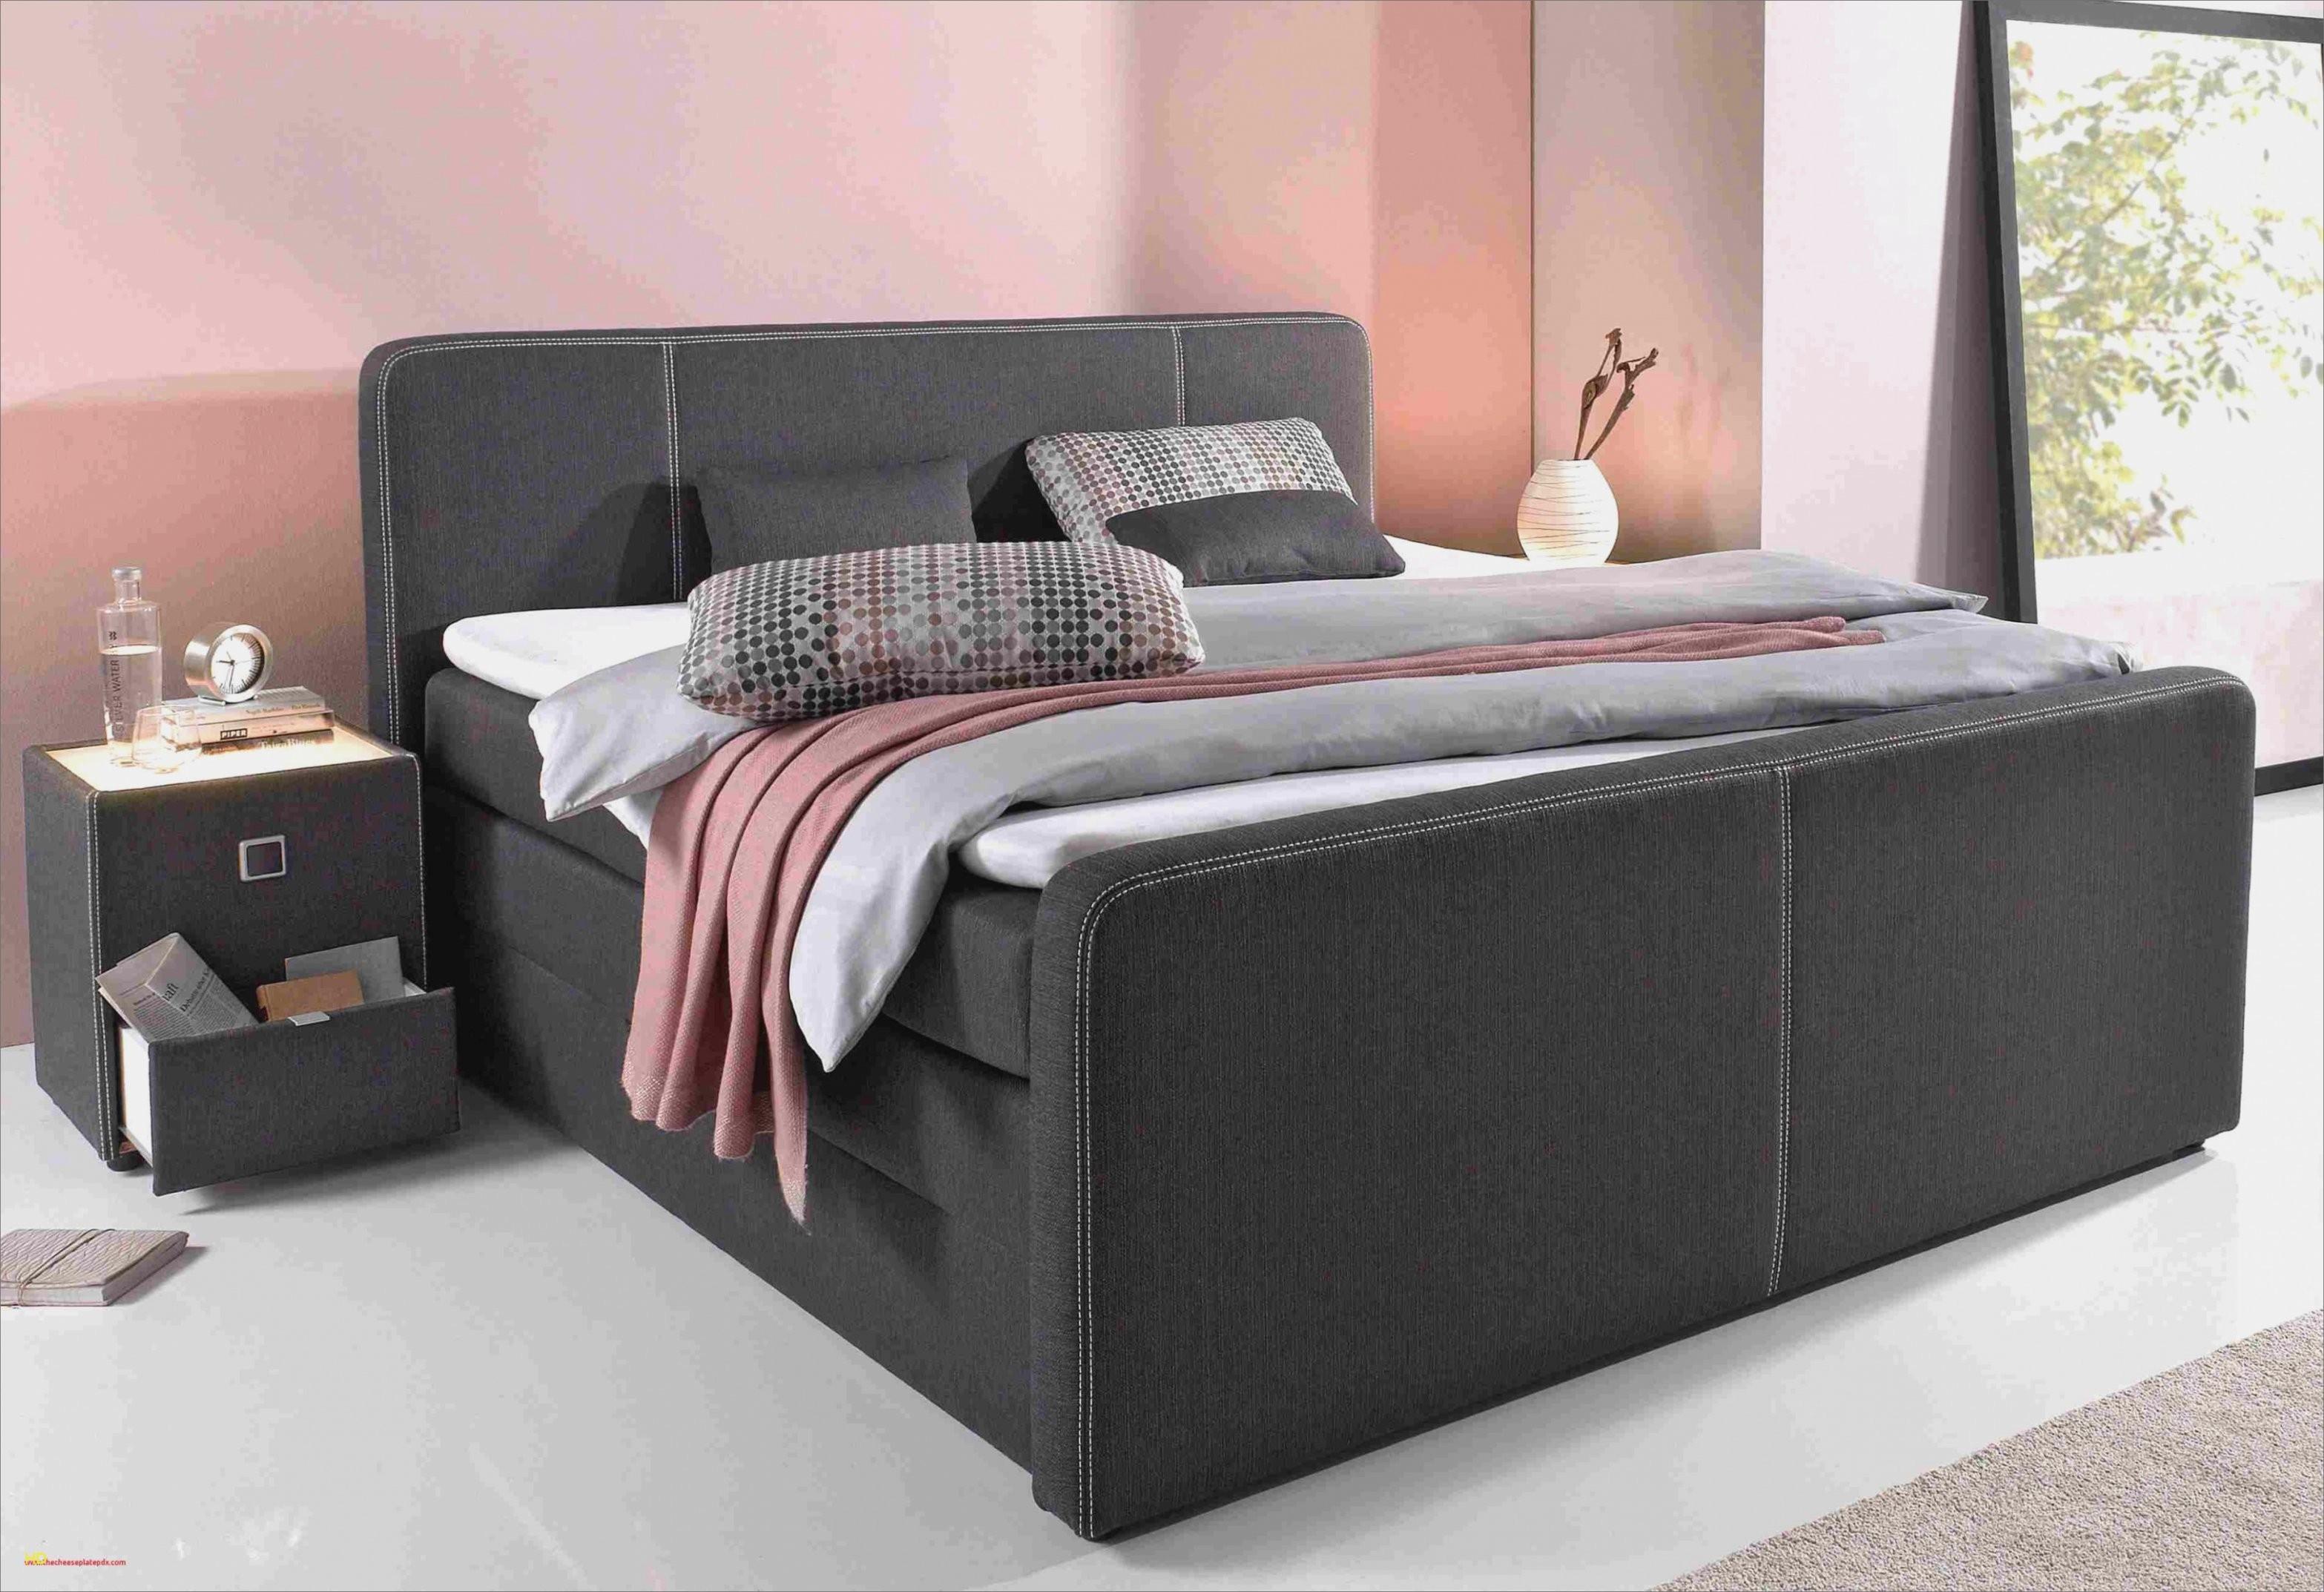 12 Elegant Bett Mit Matratze Und Lattenrost 90X200 — Yct Projekte von Bett 90X200 Mit Lattenrost Und Matratze Photo